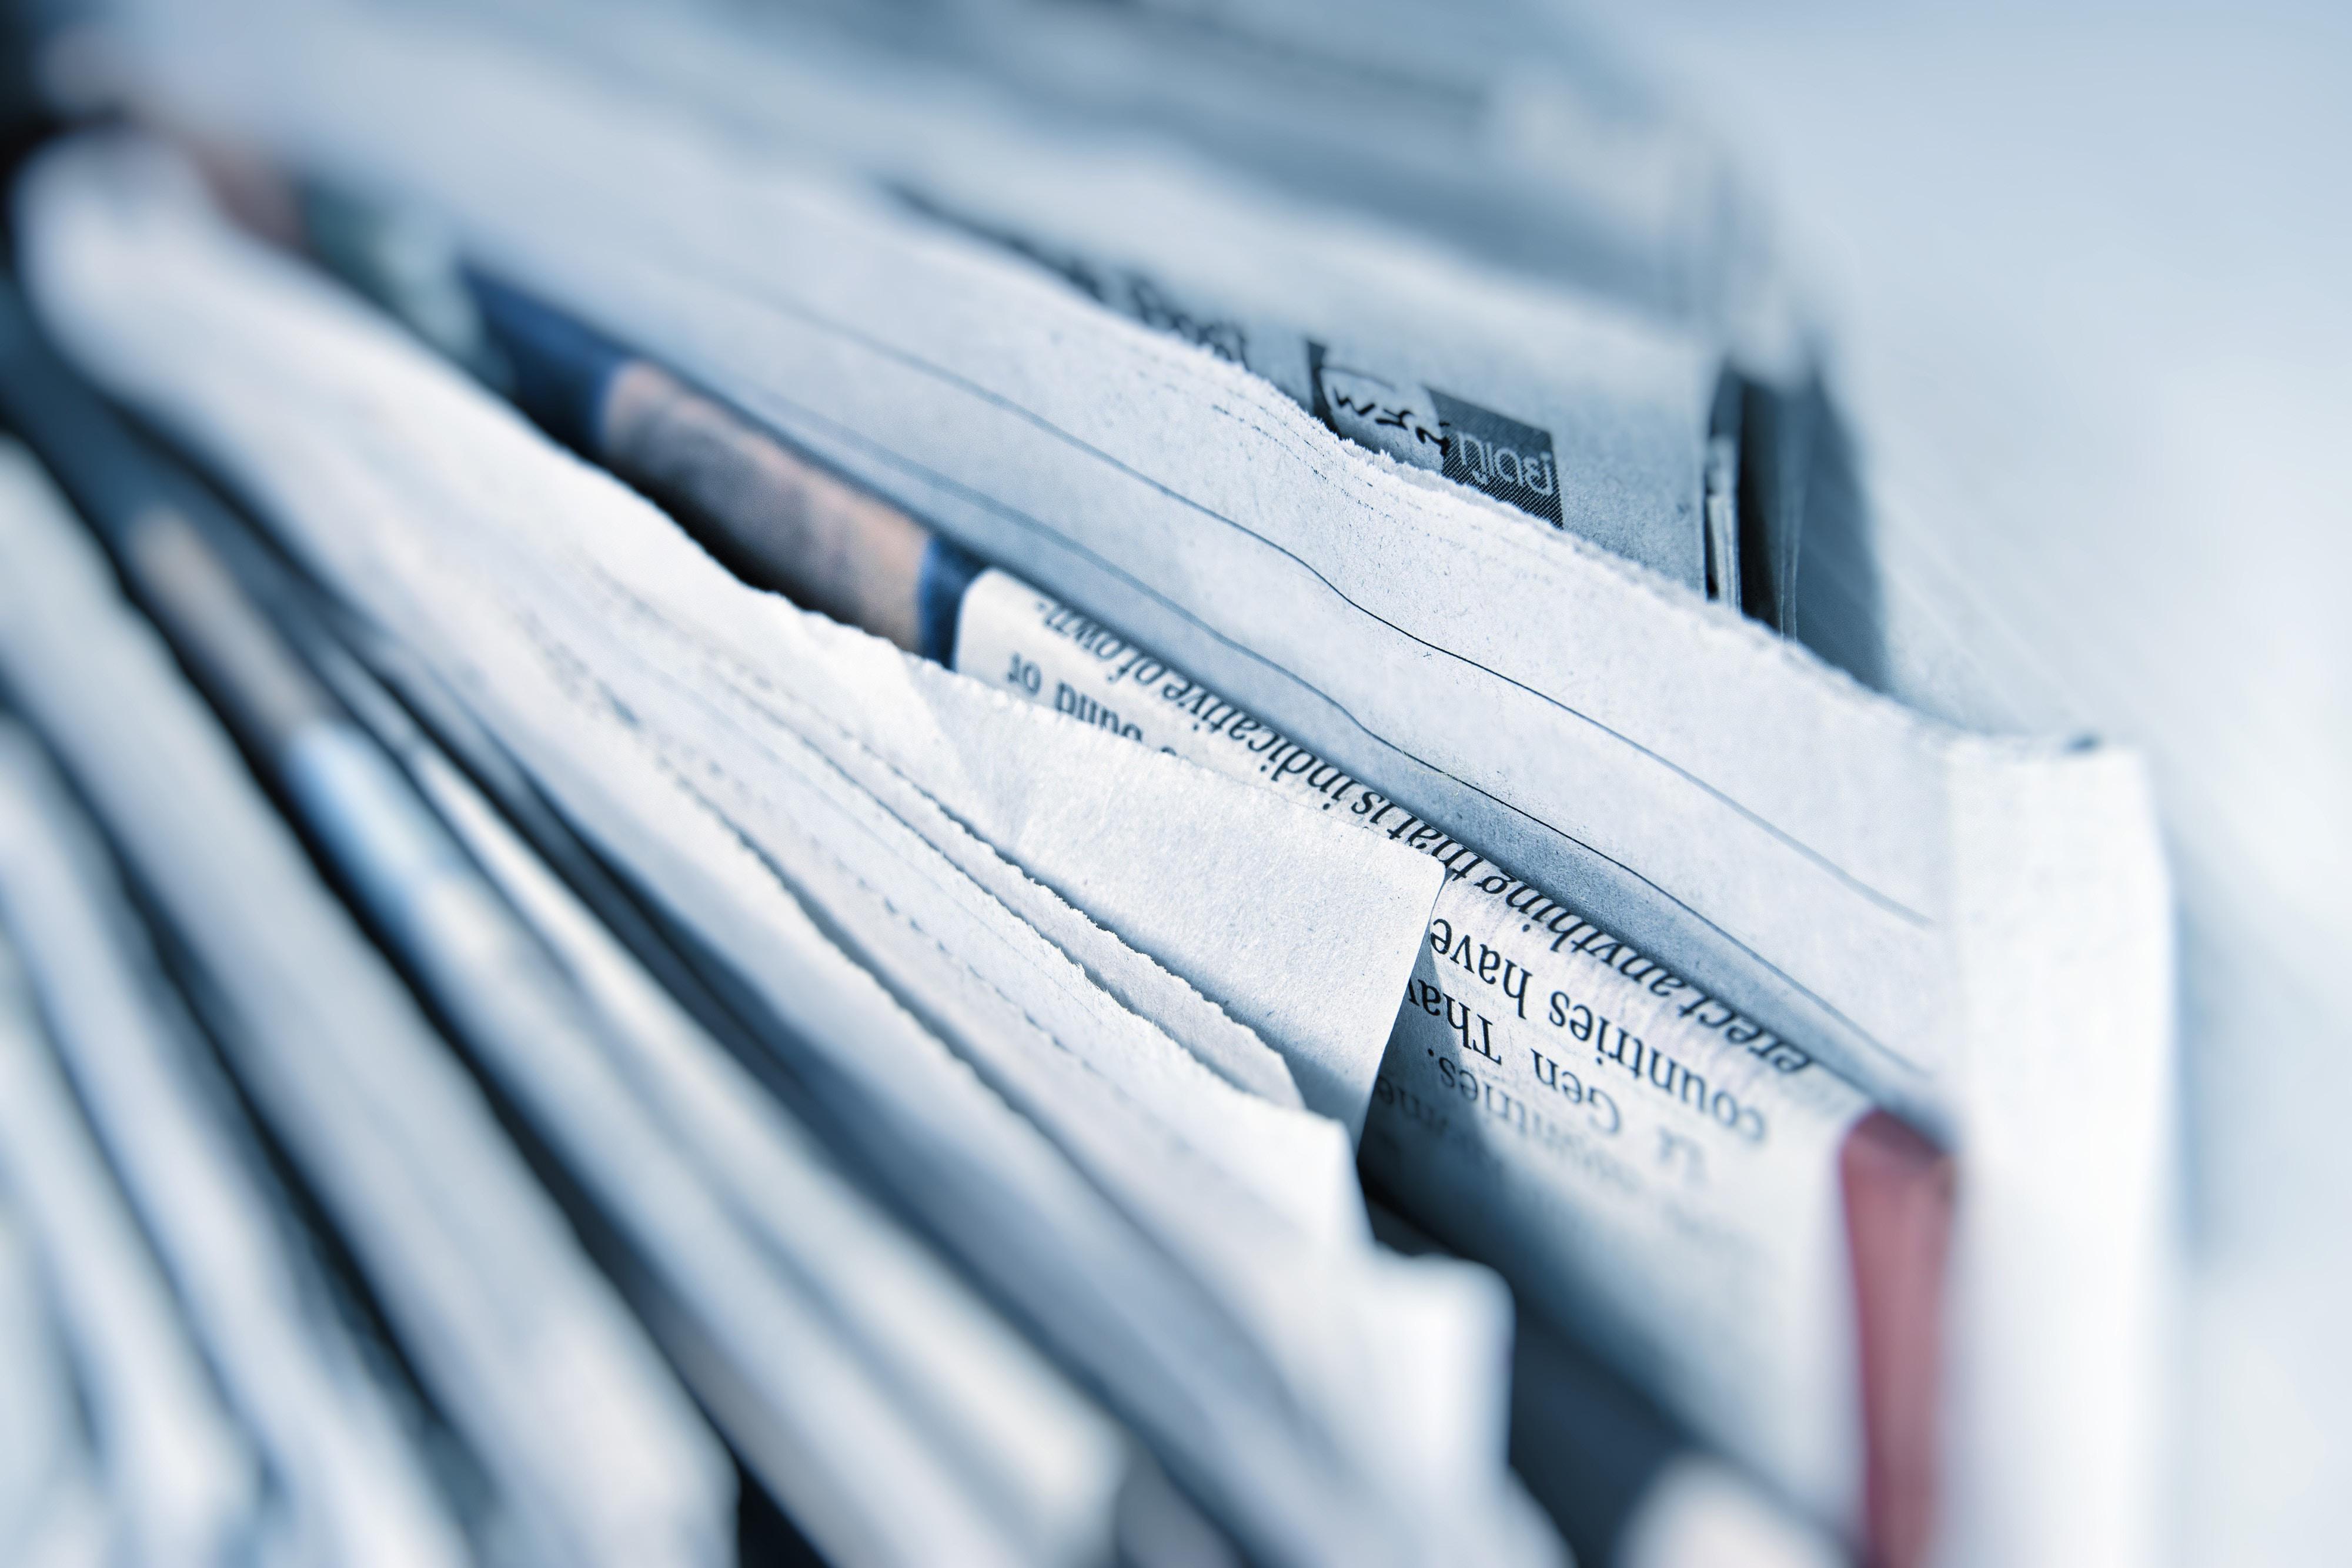 Principales portadas de diarios